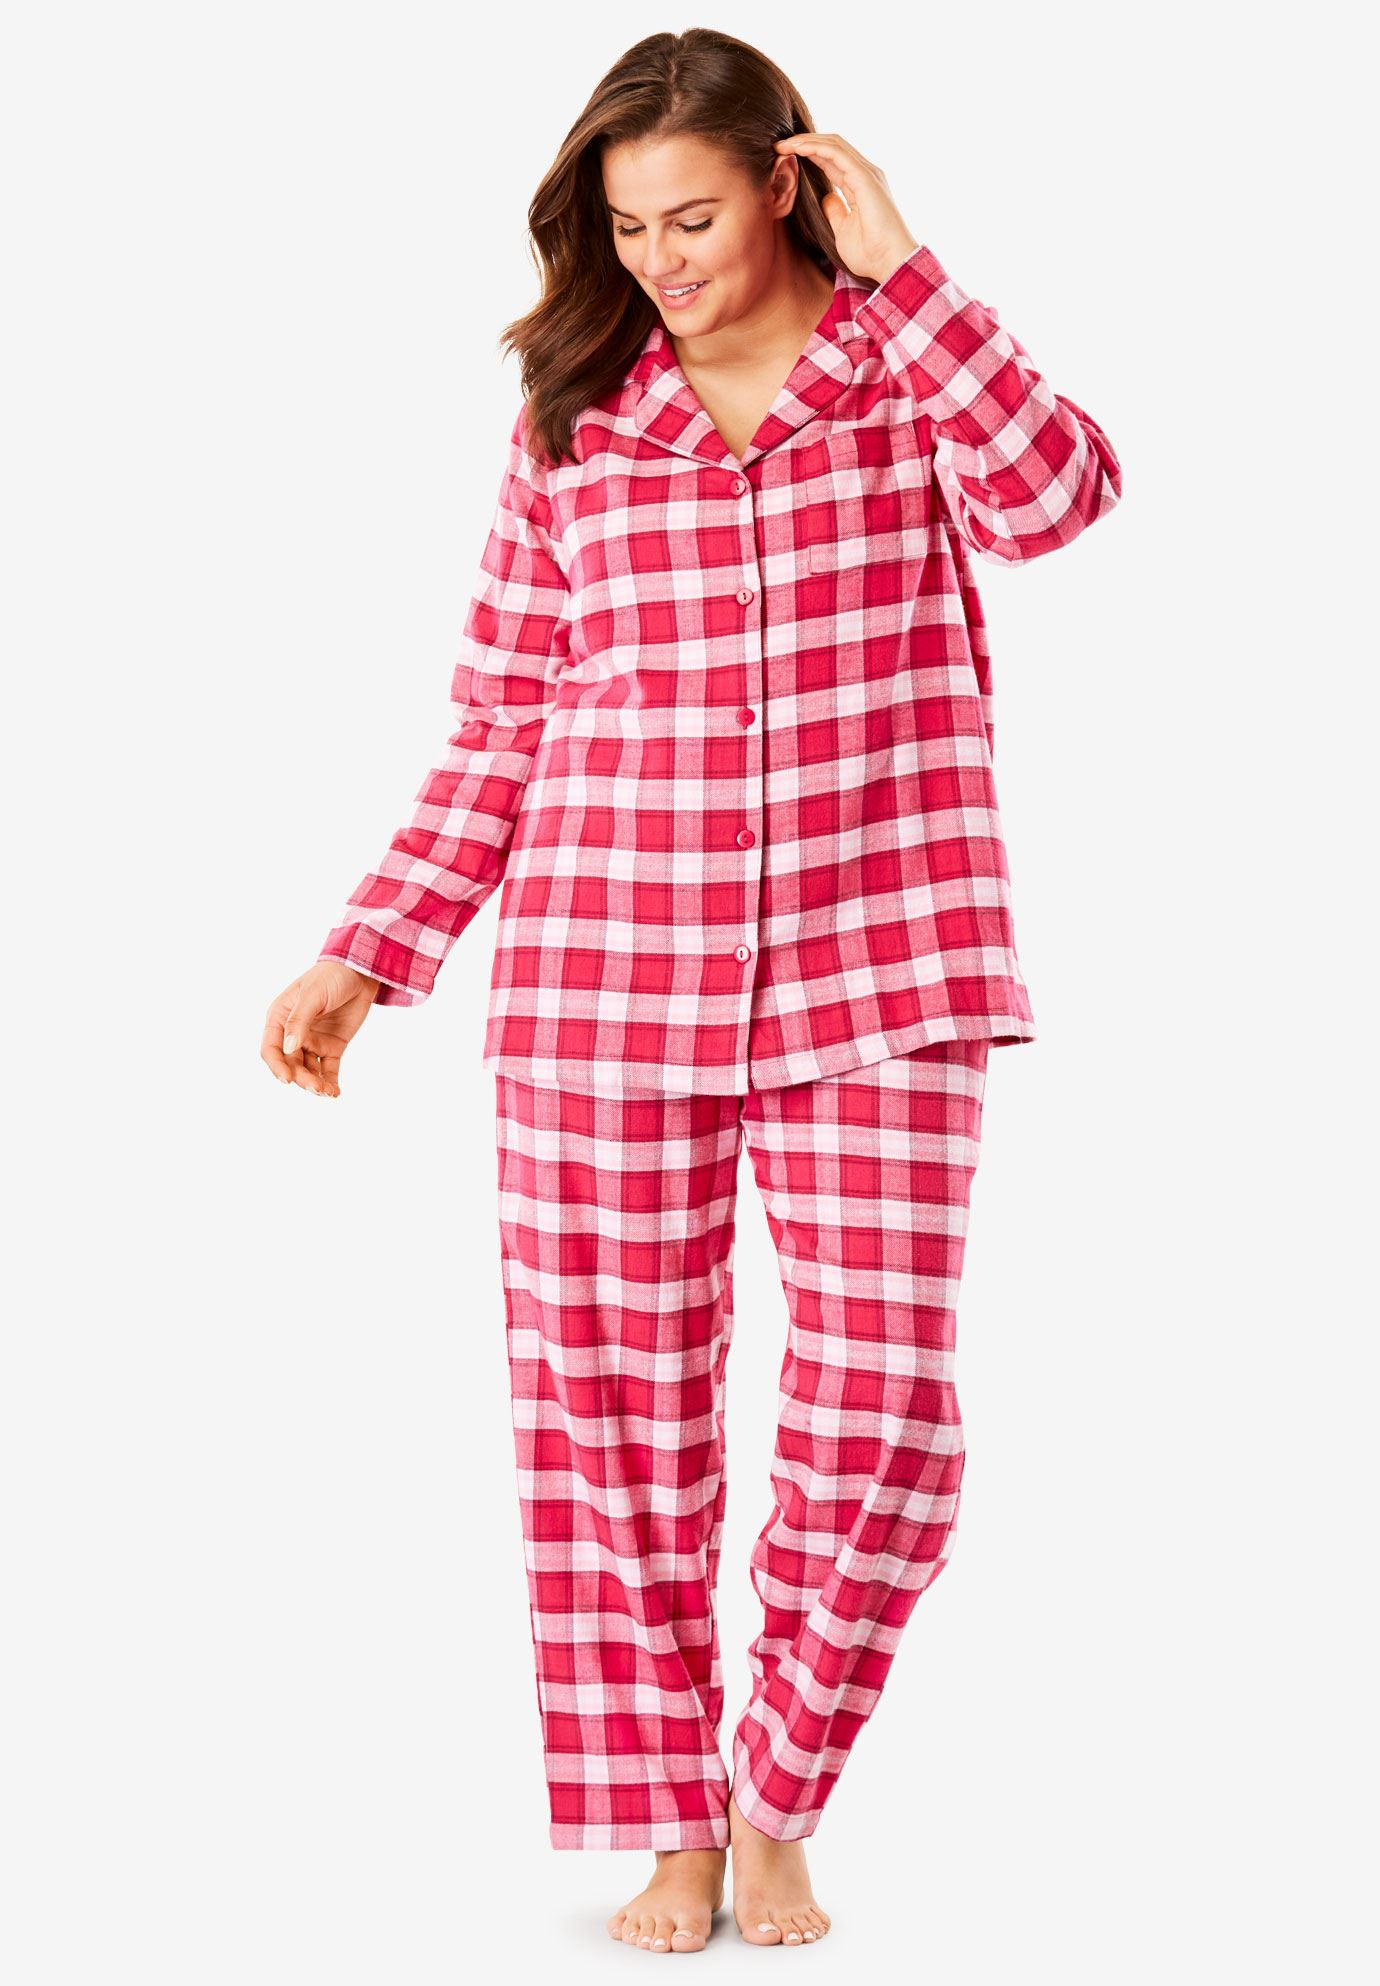 Plaid Flannel Pj Set By Dreams Co Women S Plus Size Clothing Dress Shirts For Women Plus Size Outfits Pajama Set